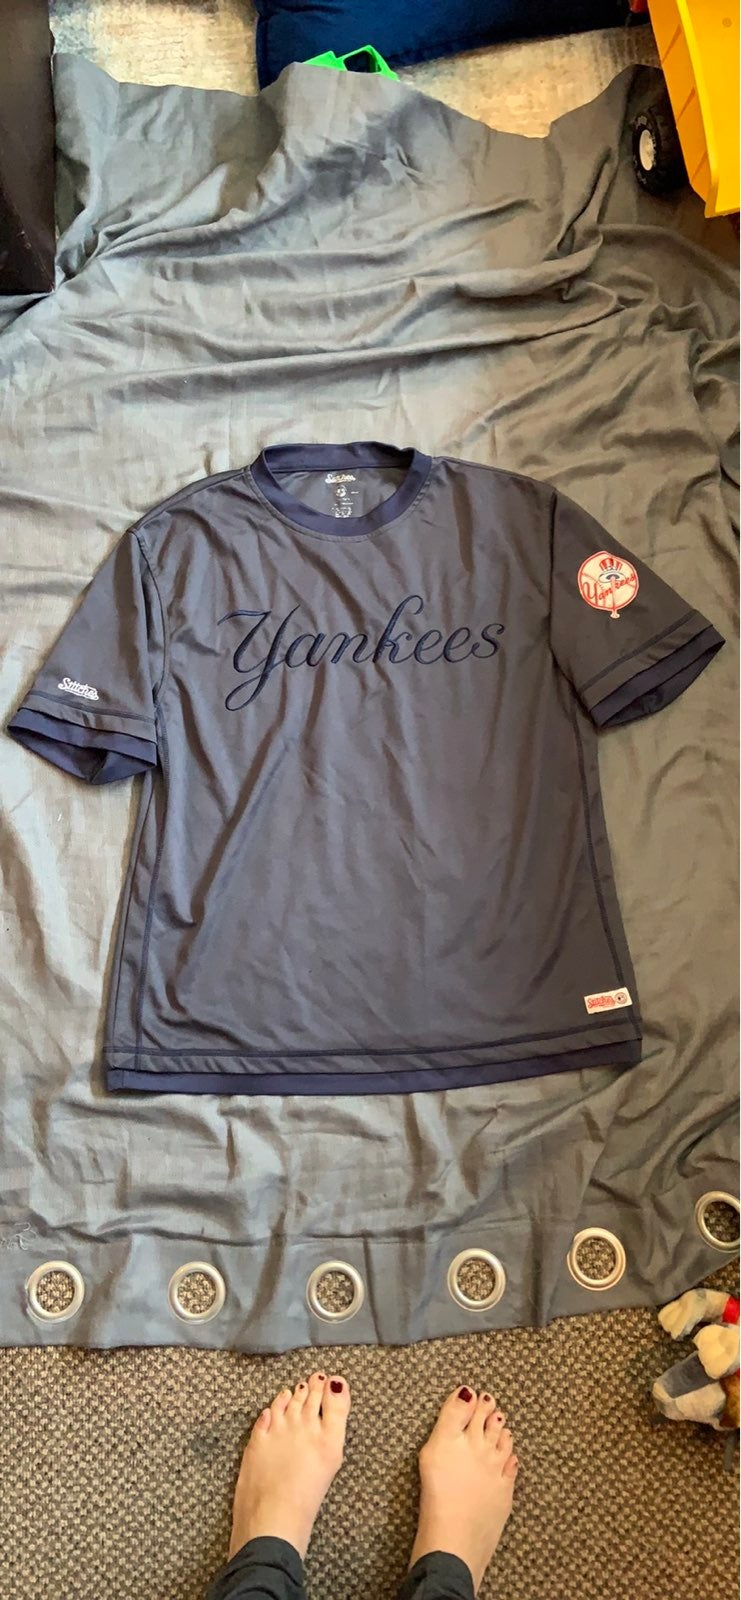 Vintage Stitches Yankees Jersey